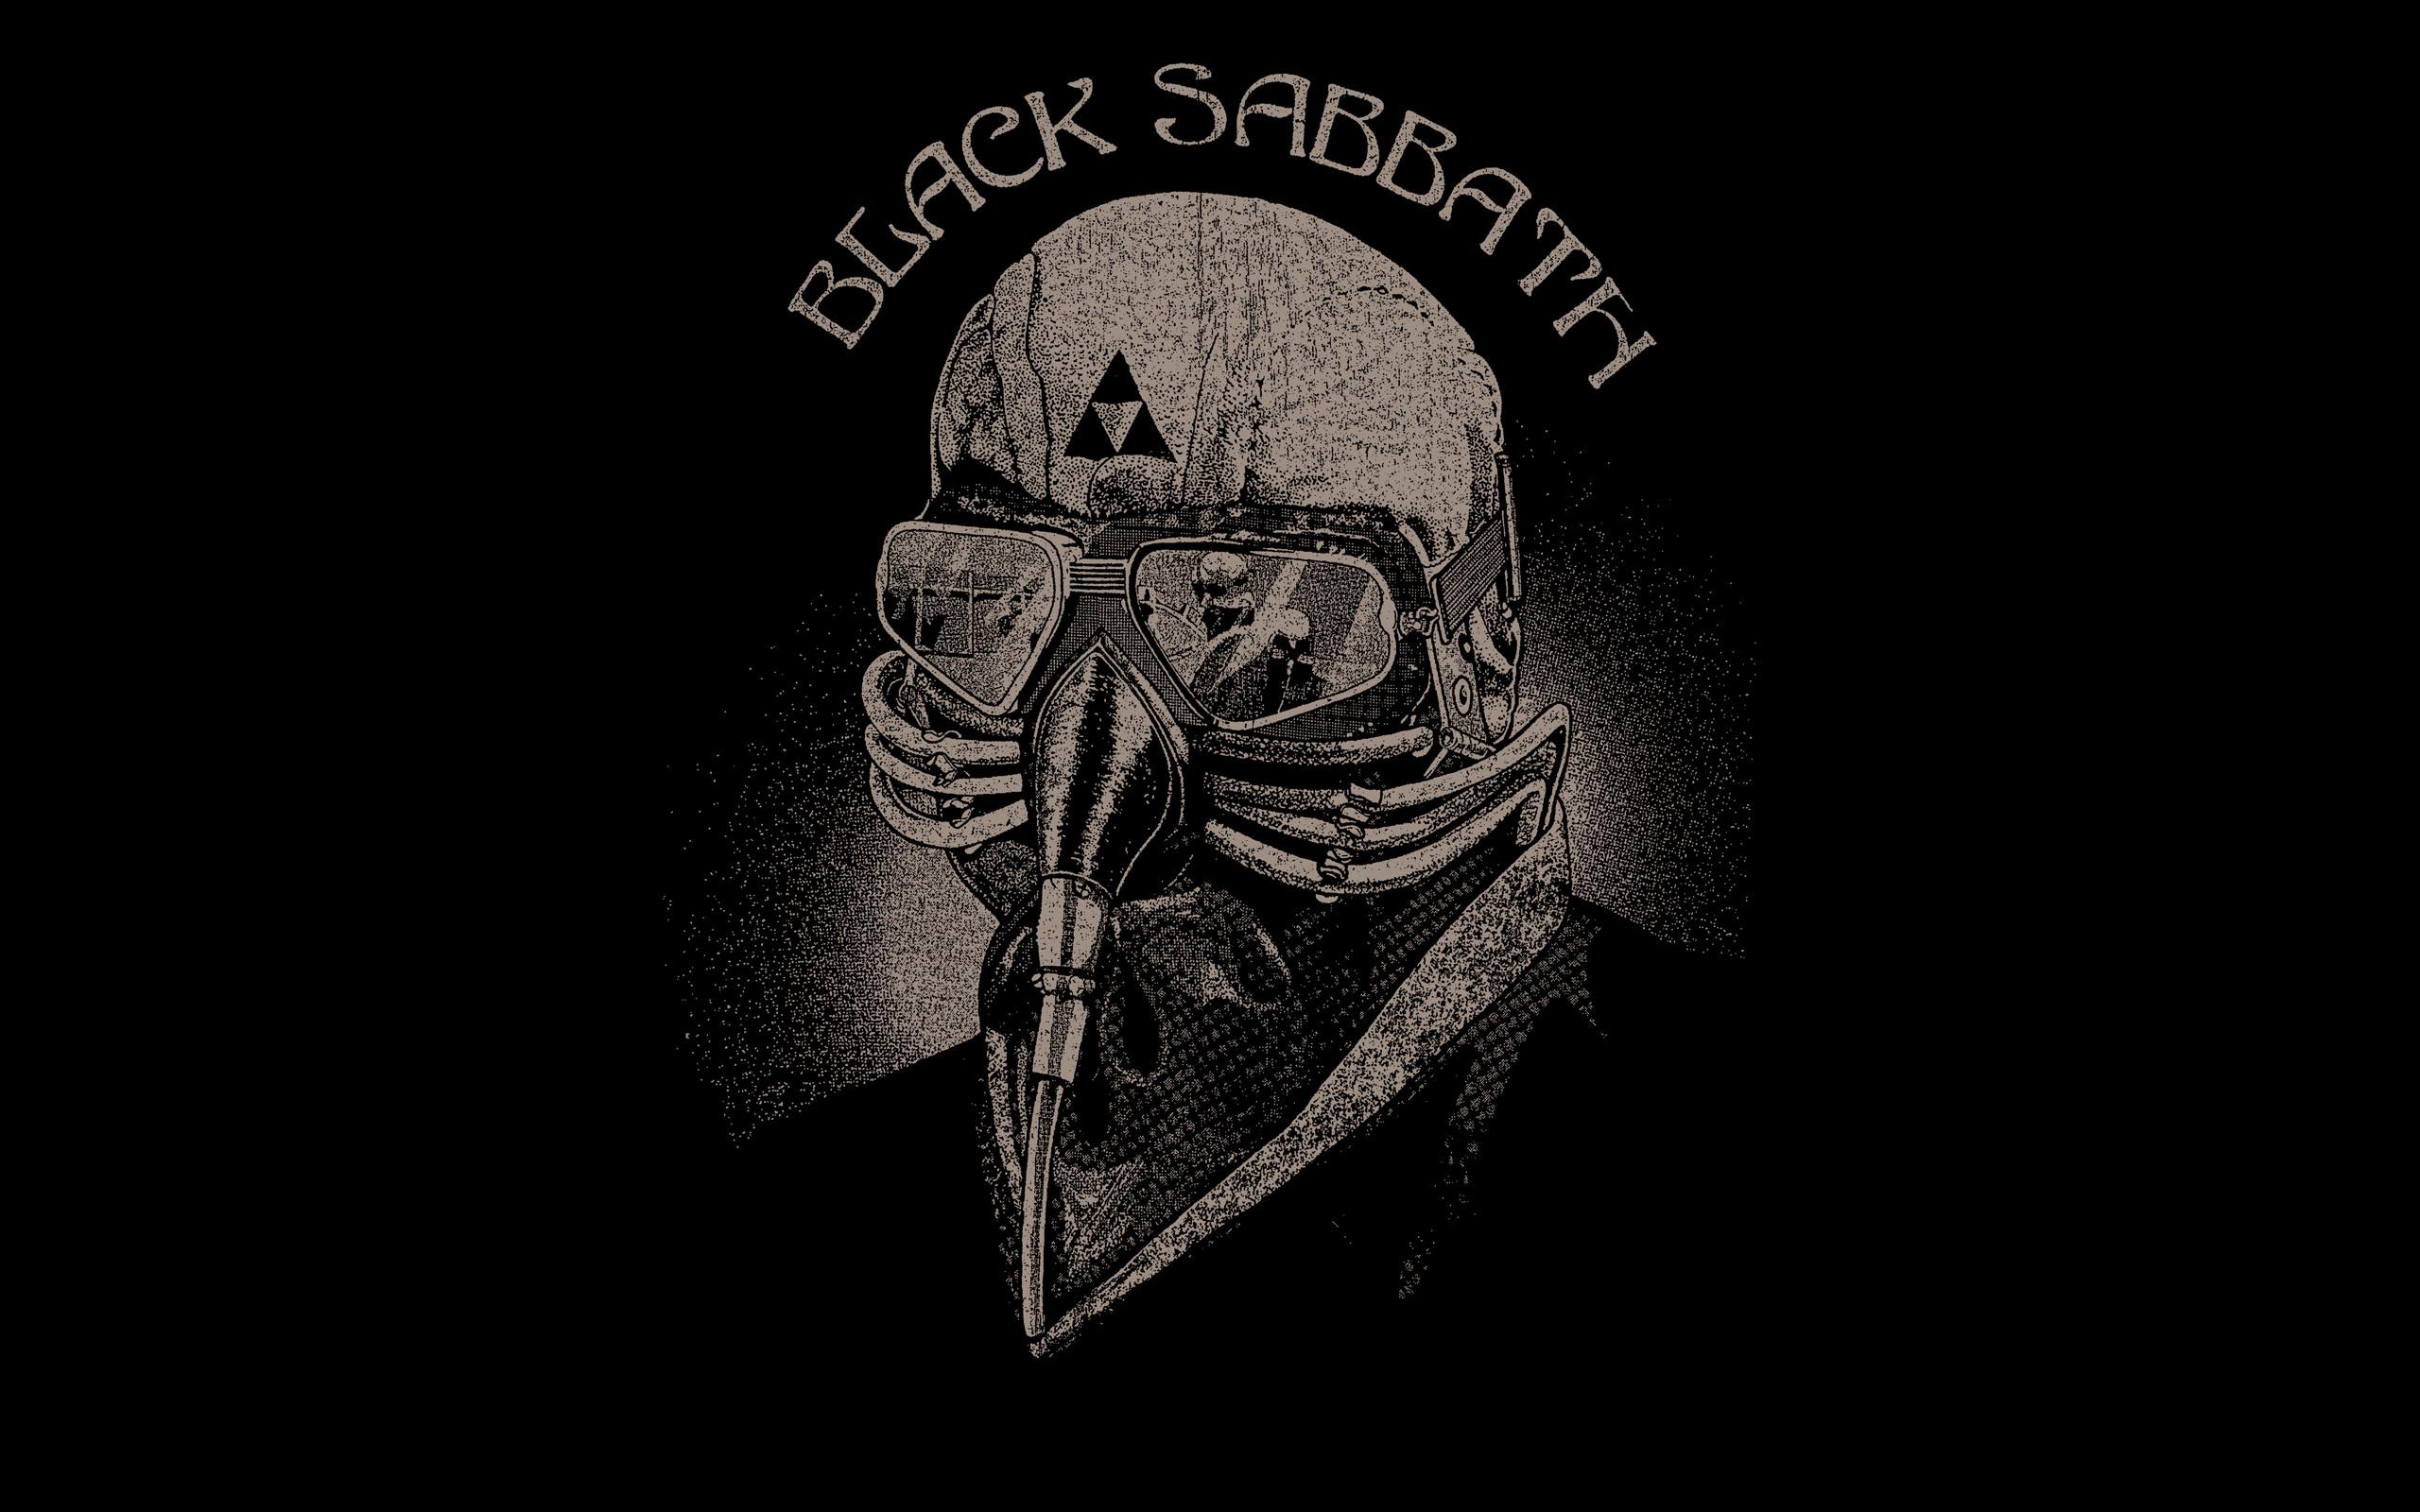 Black Sabbath: Never Say Die [2560x1600]  BEST WALLPAPERS ON Your Phone  Black Sabbath